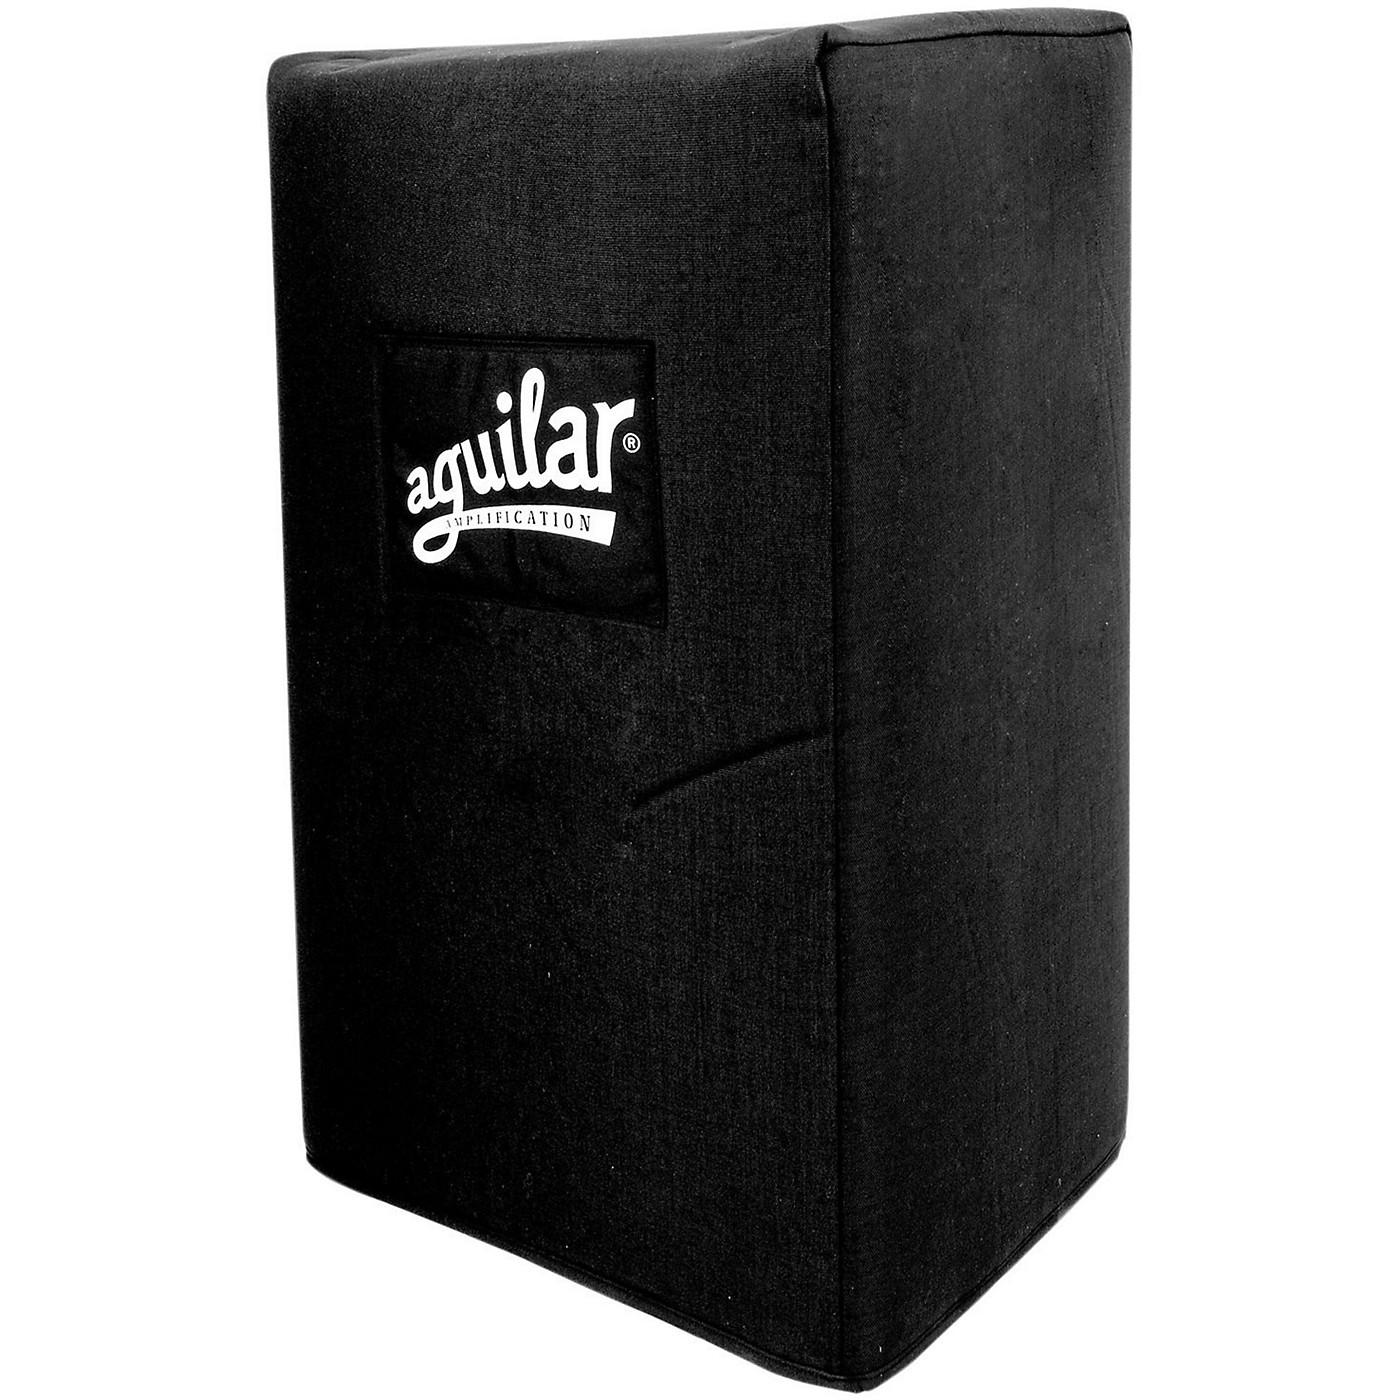 Aguilar DB 8x10/DB 4x12 Cabinet Cover thumbnail